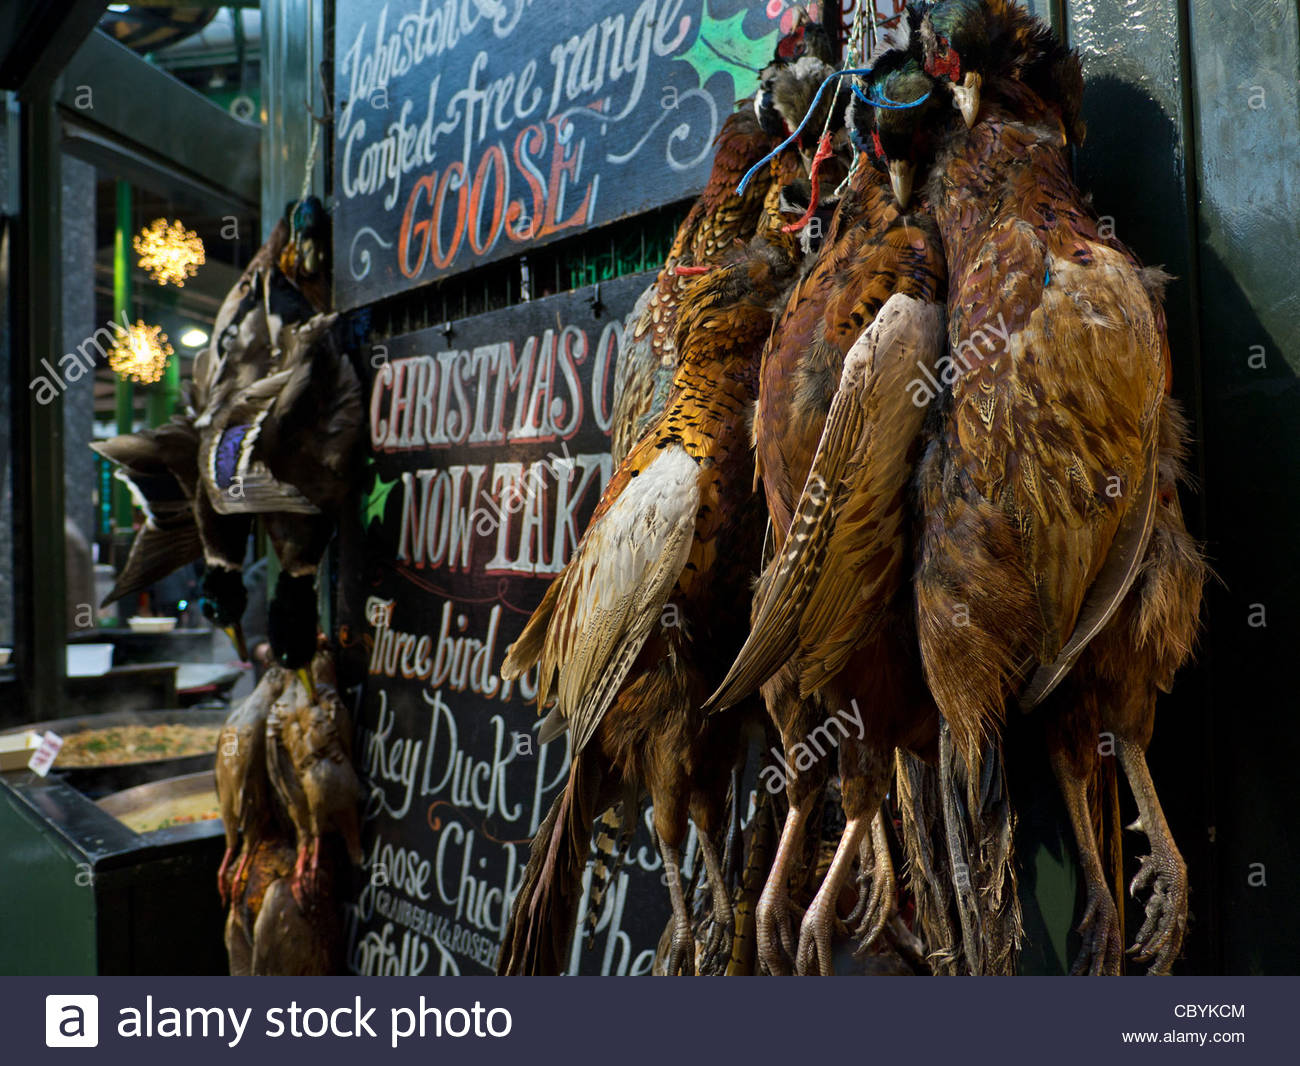 CHRISTMAS GAME BIRDS Selection of game bird hanging on display for sale at Borough Market interior Christmas stall - Stock Image